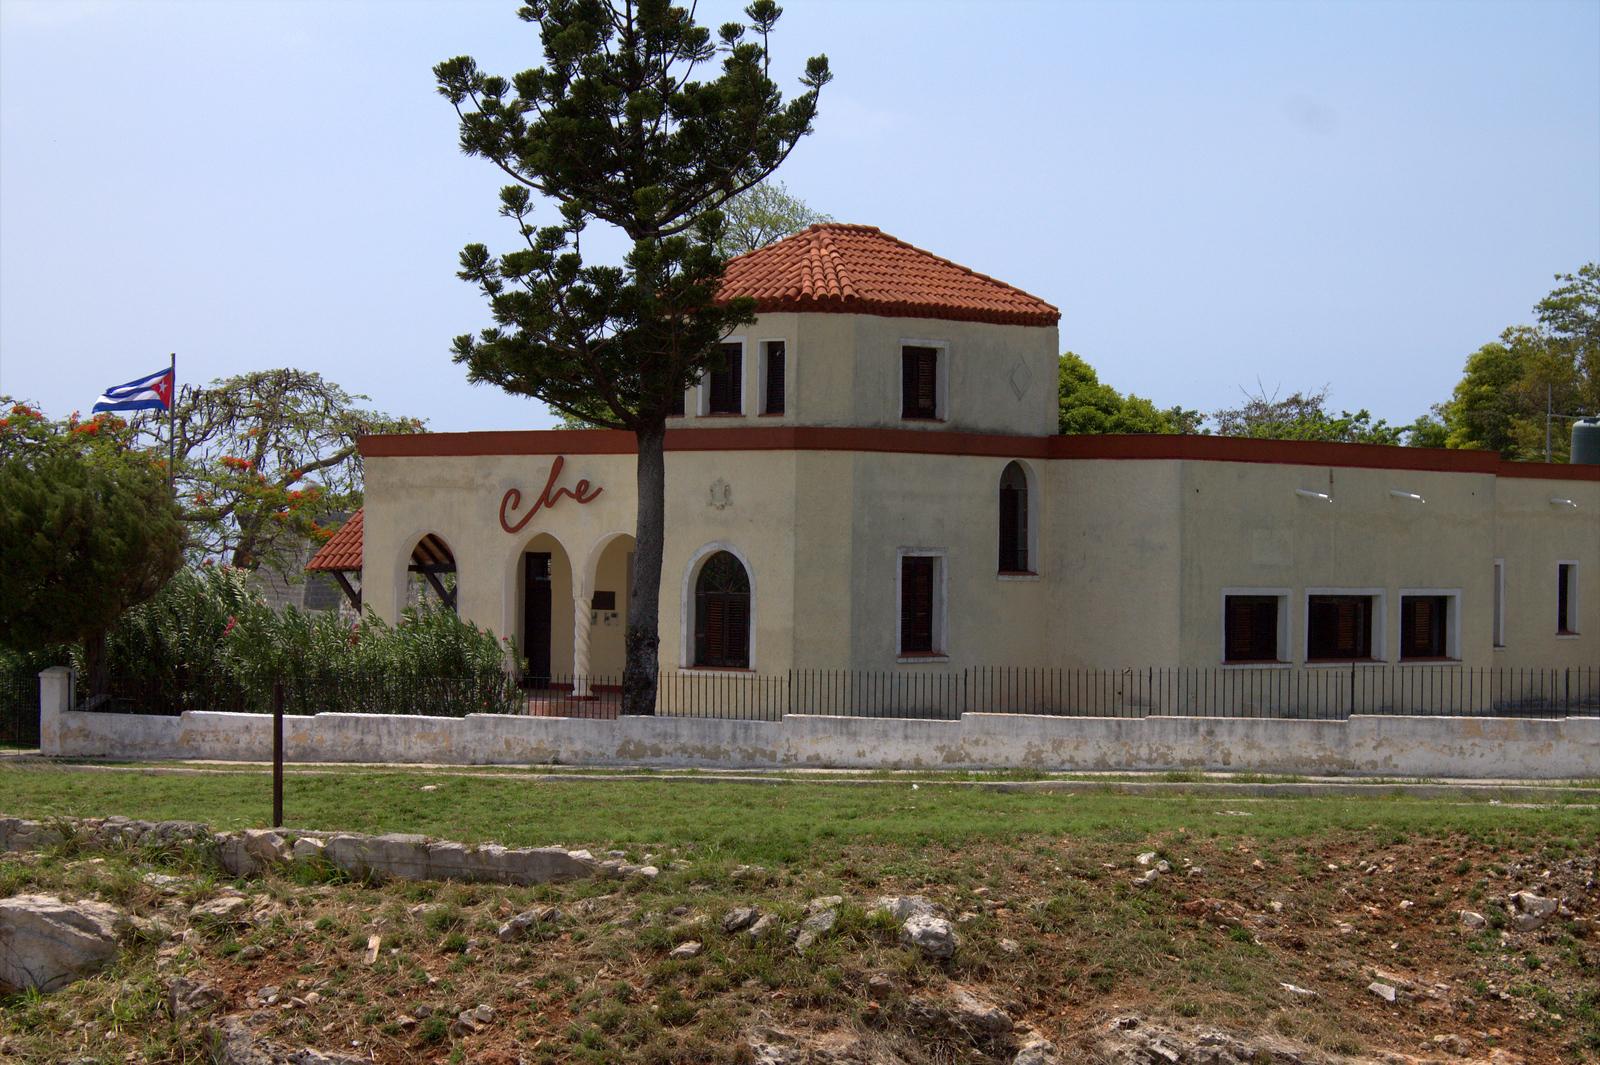 Che house in Havana, Cuba